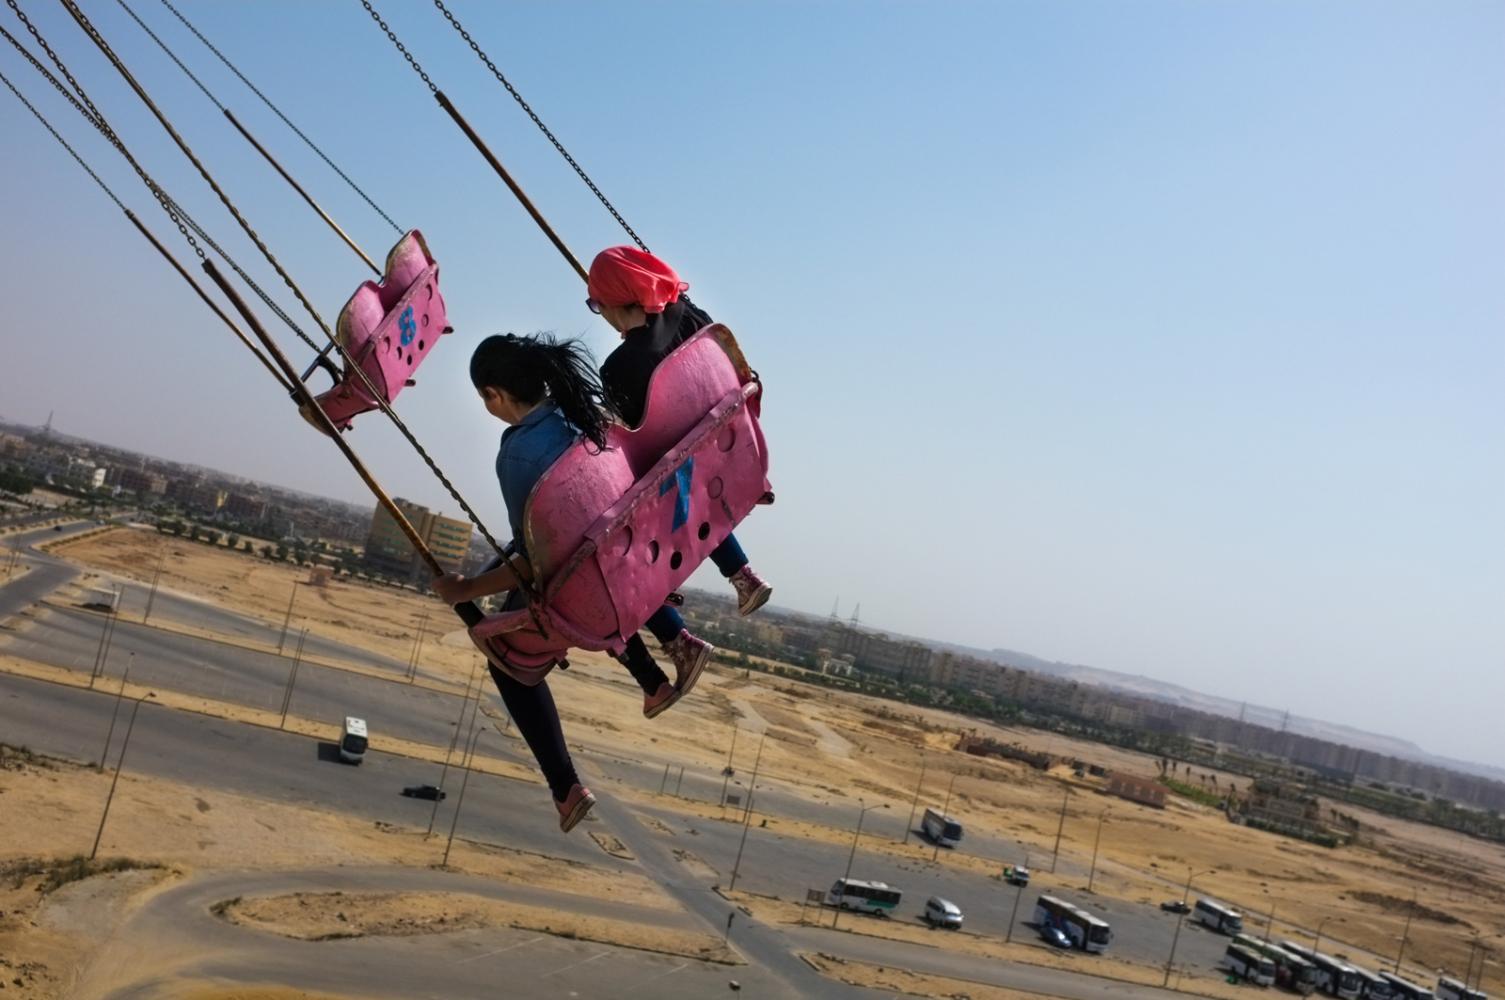 Dreampark - Cairo's desert amusement park